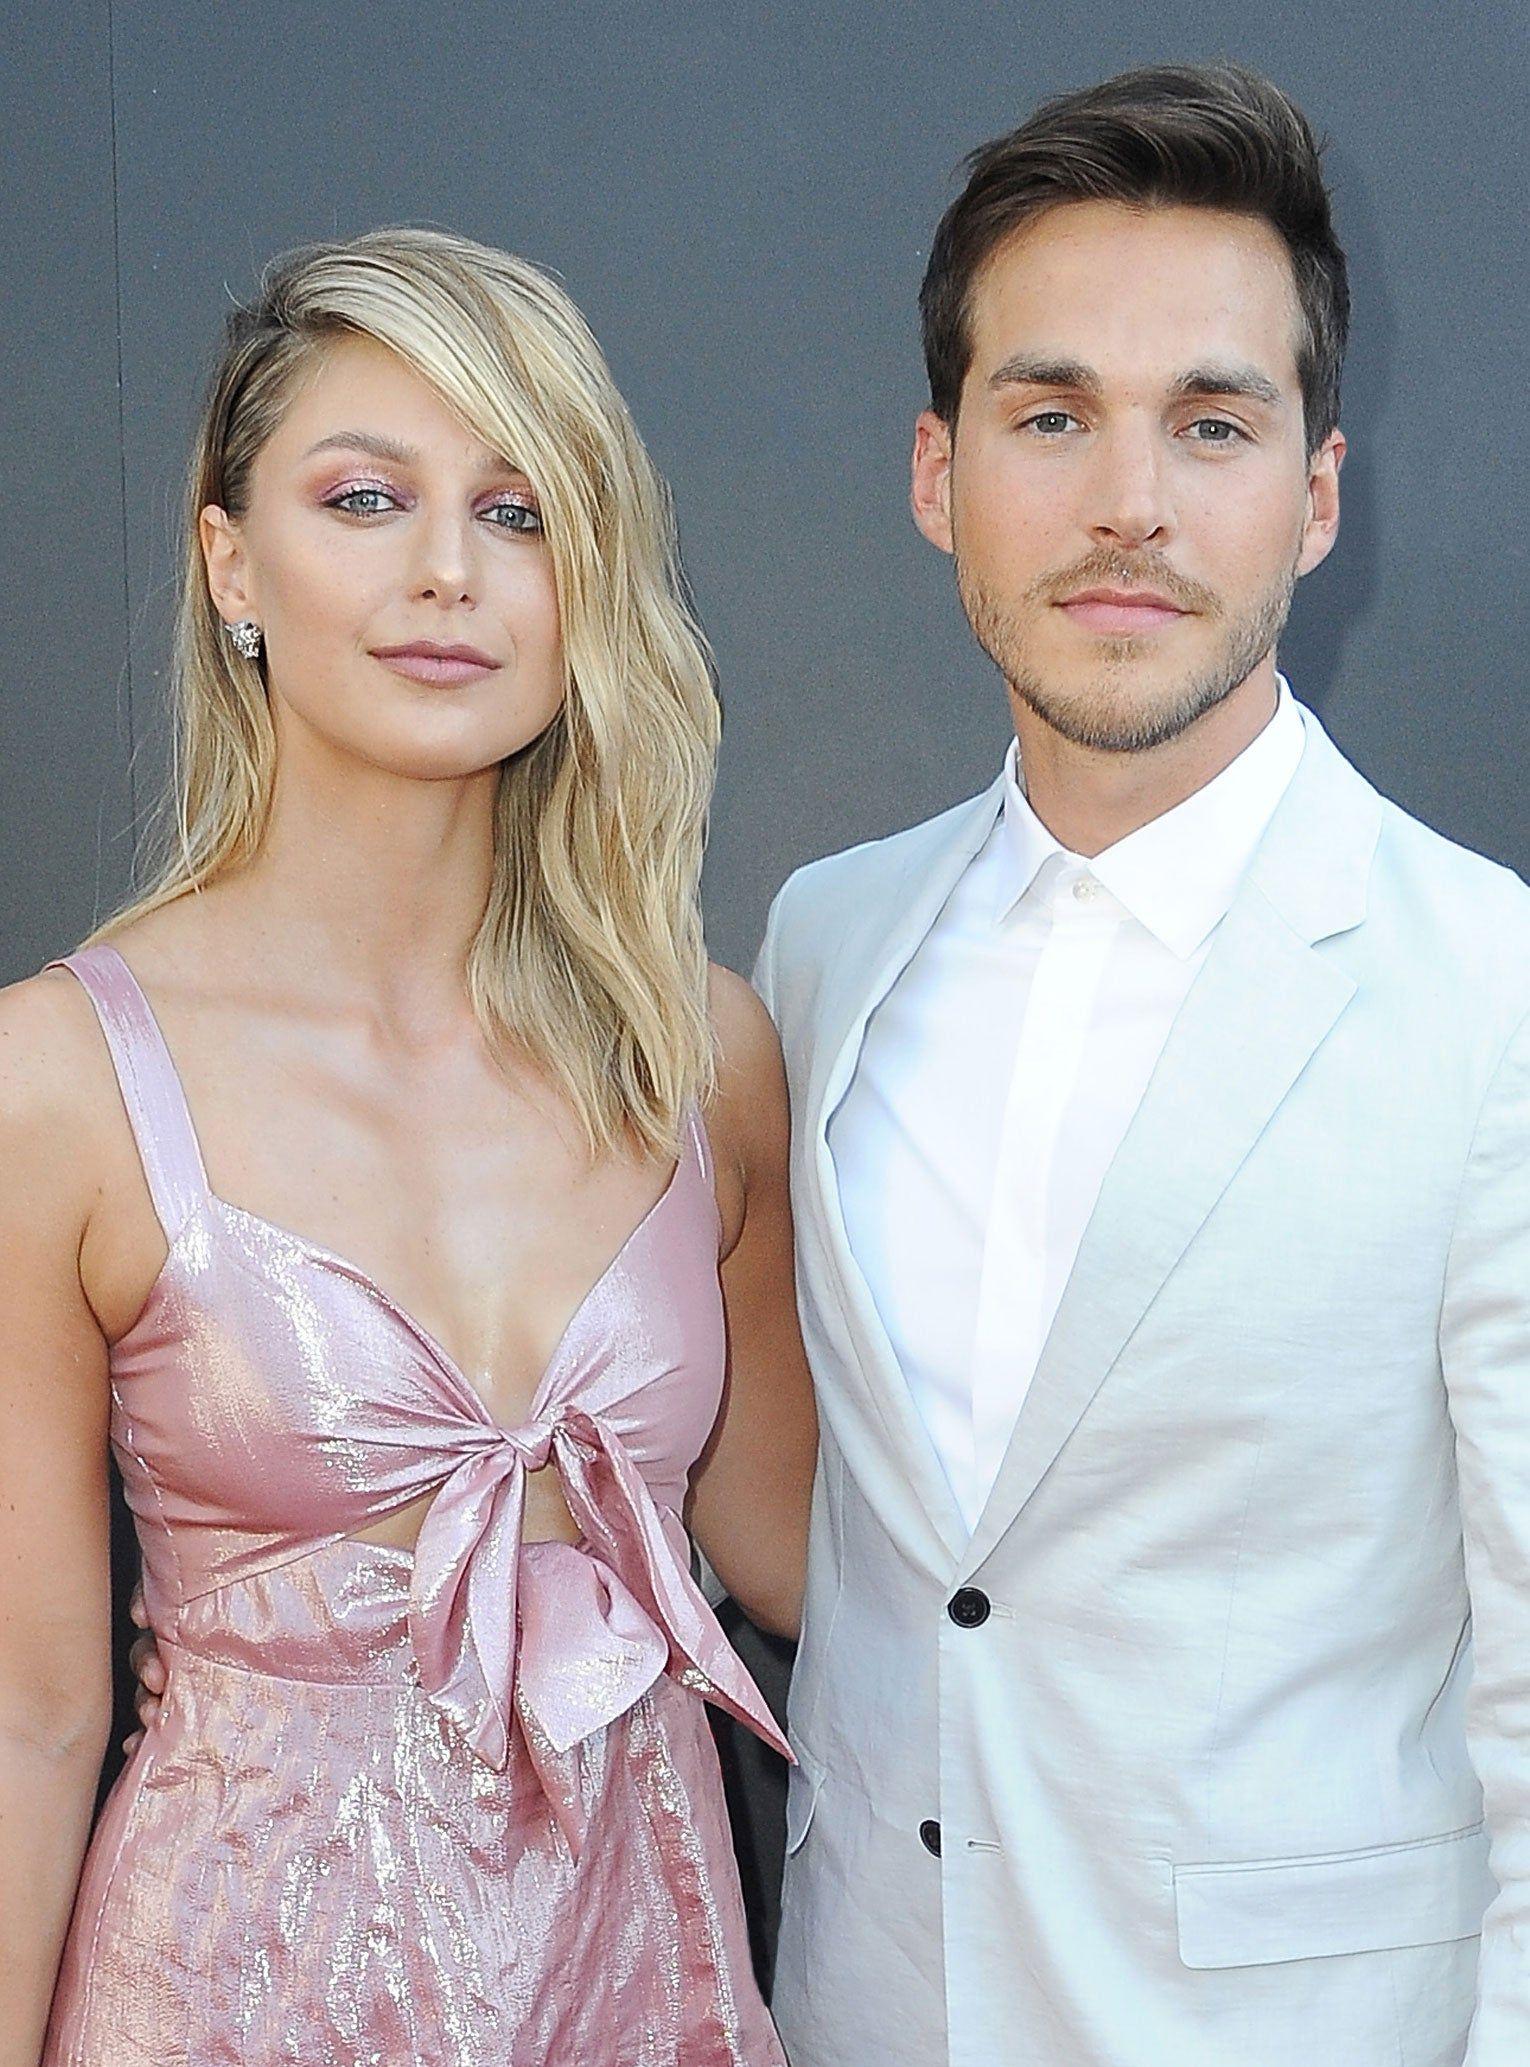 Melissa Benoist Is Expecting With Her Supergirl Co Star Chris Wood In 2020 Melissa Benoist Wedding Chris Wood Supergirl